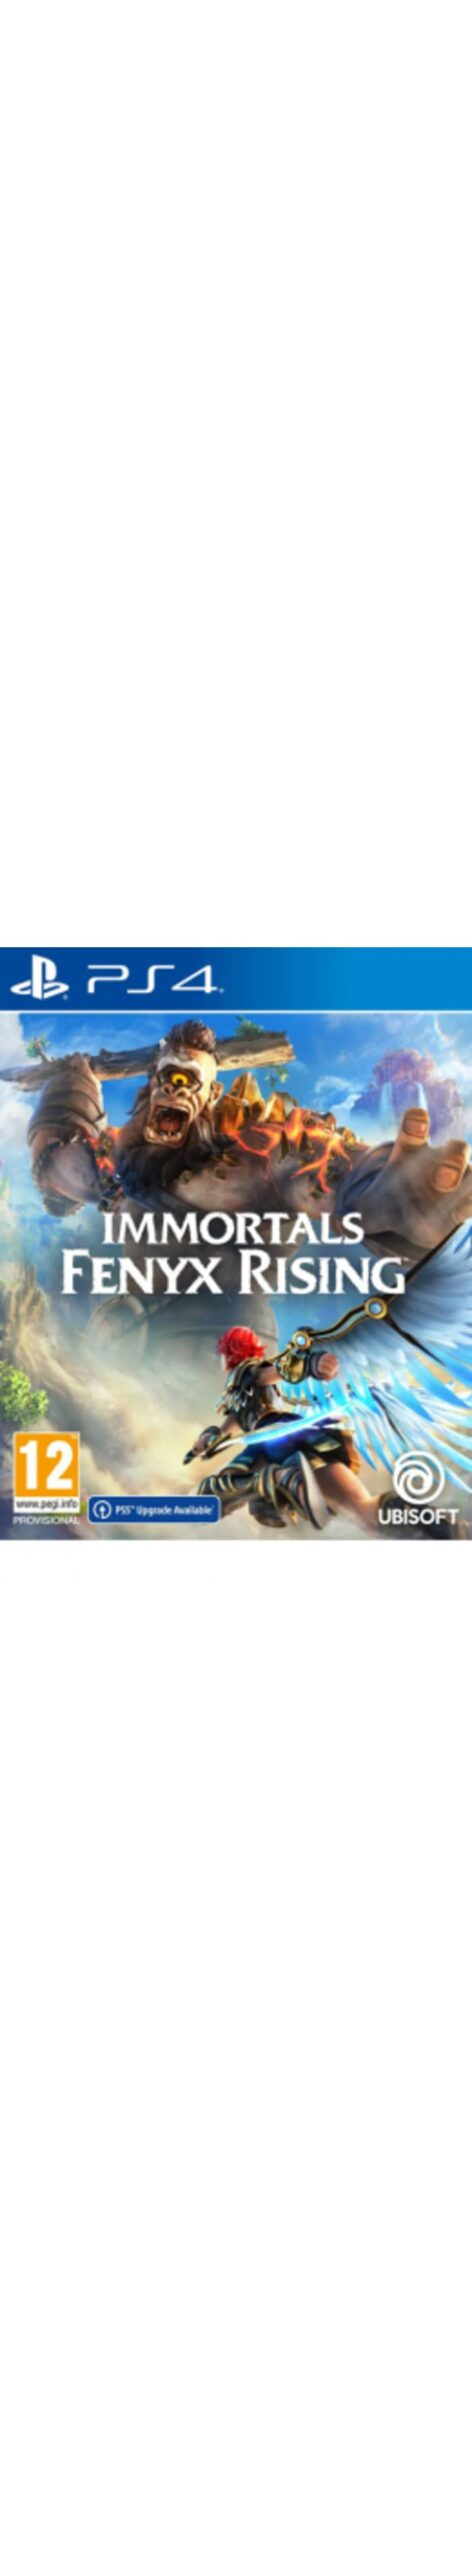 PS4 Immortals: Fenyx Rising Shadowmaster edition